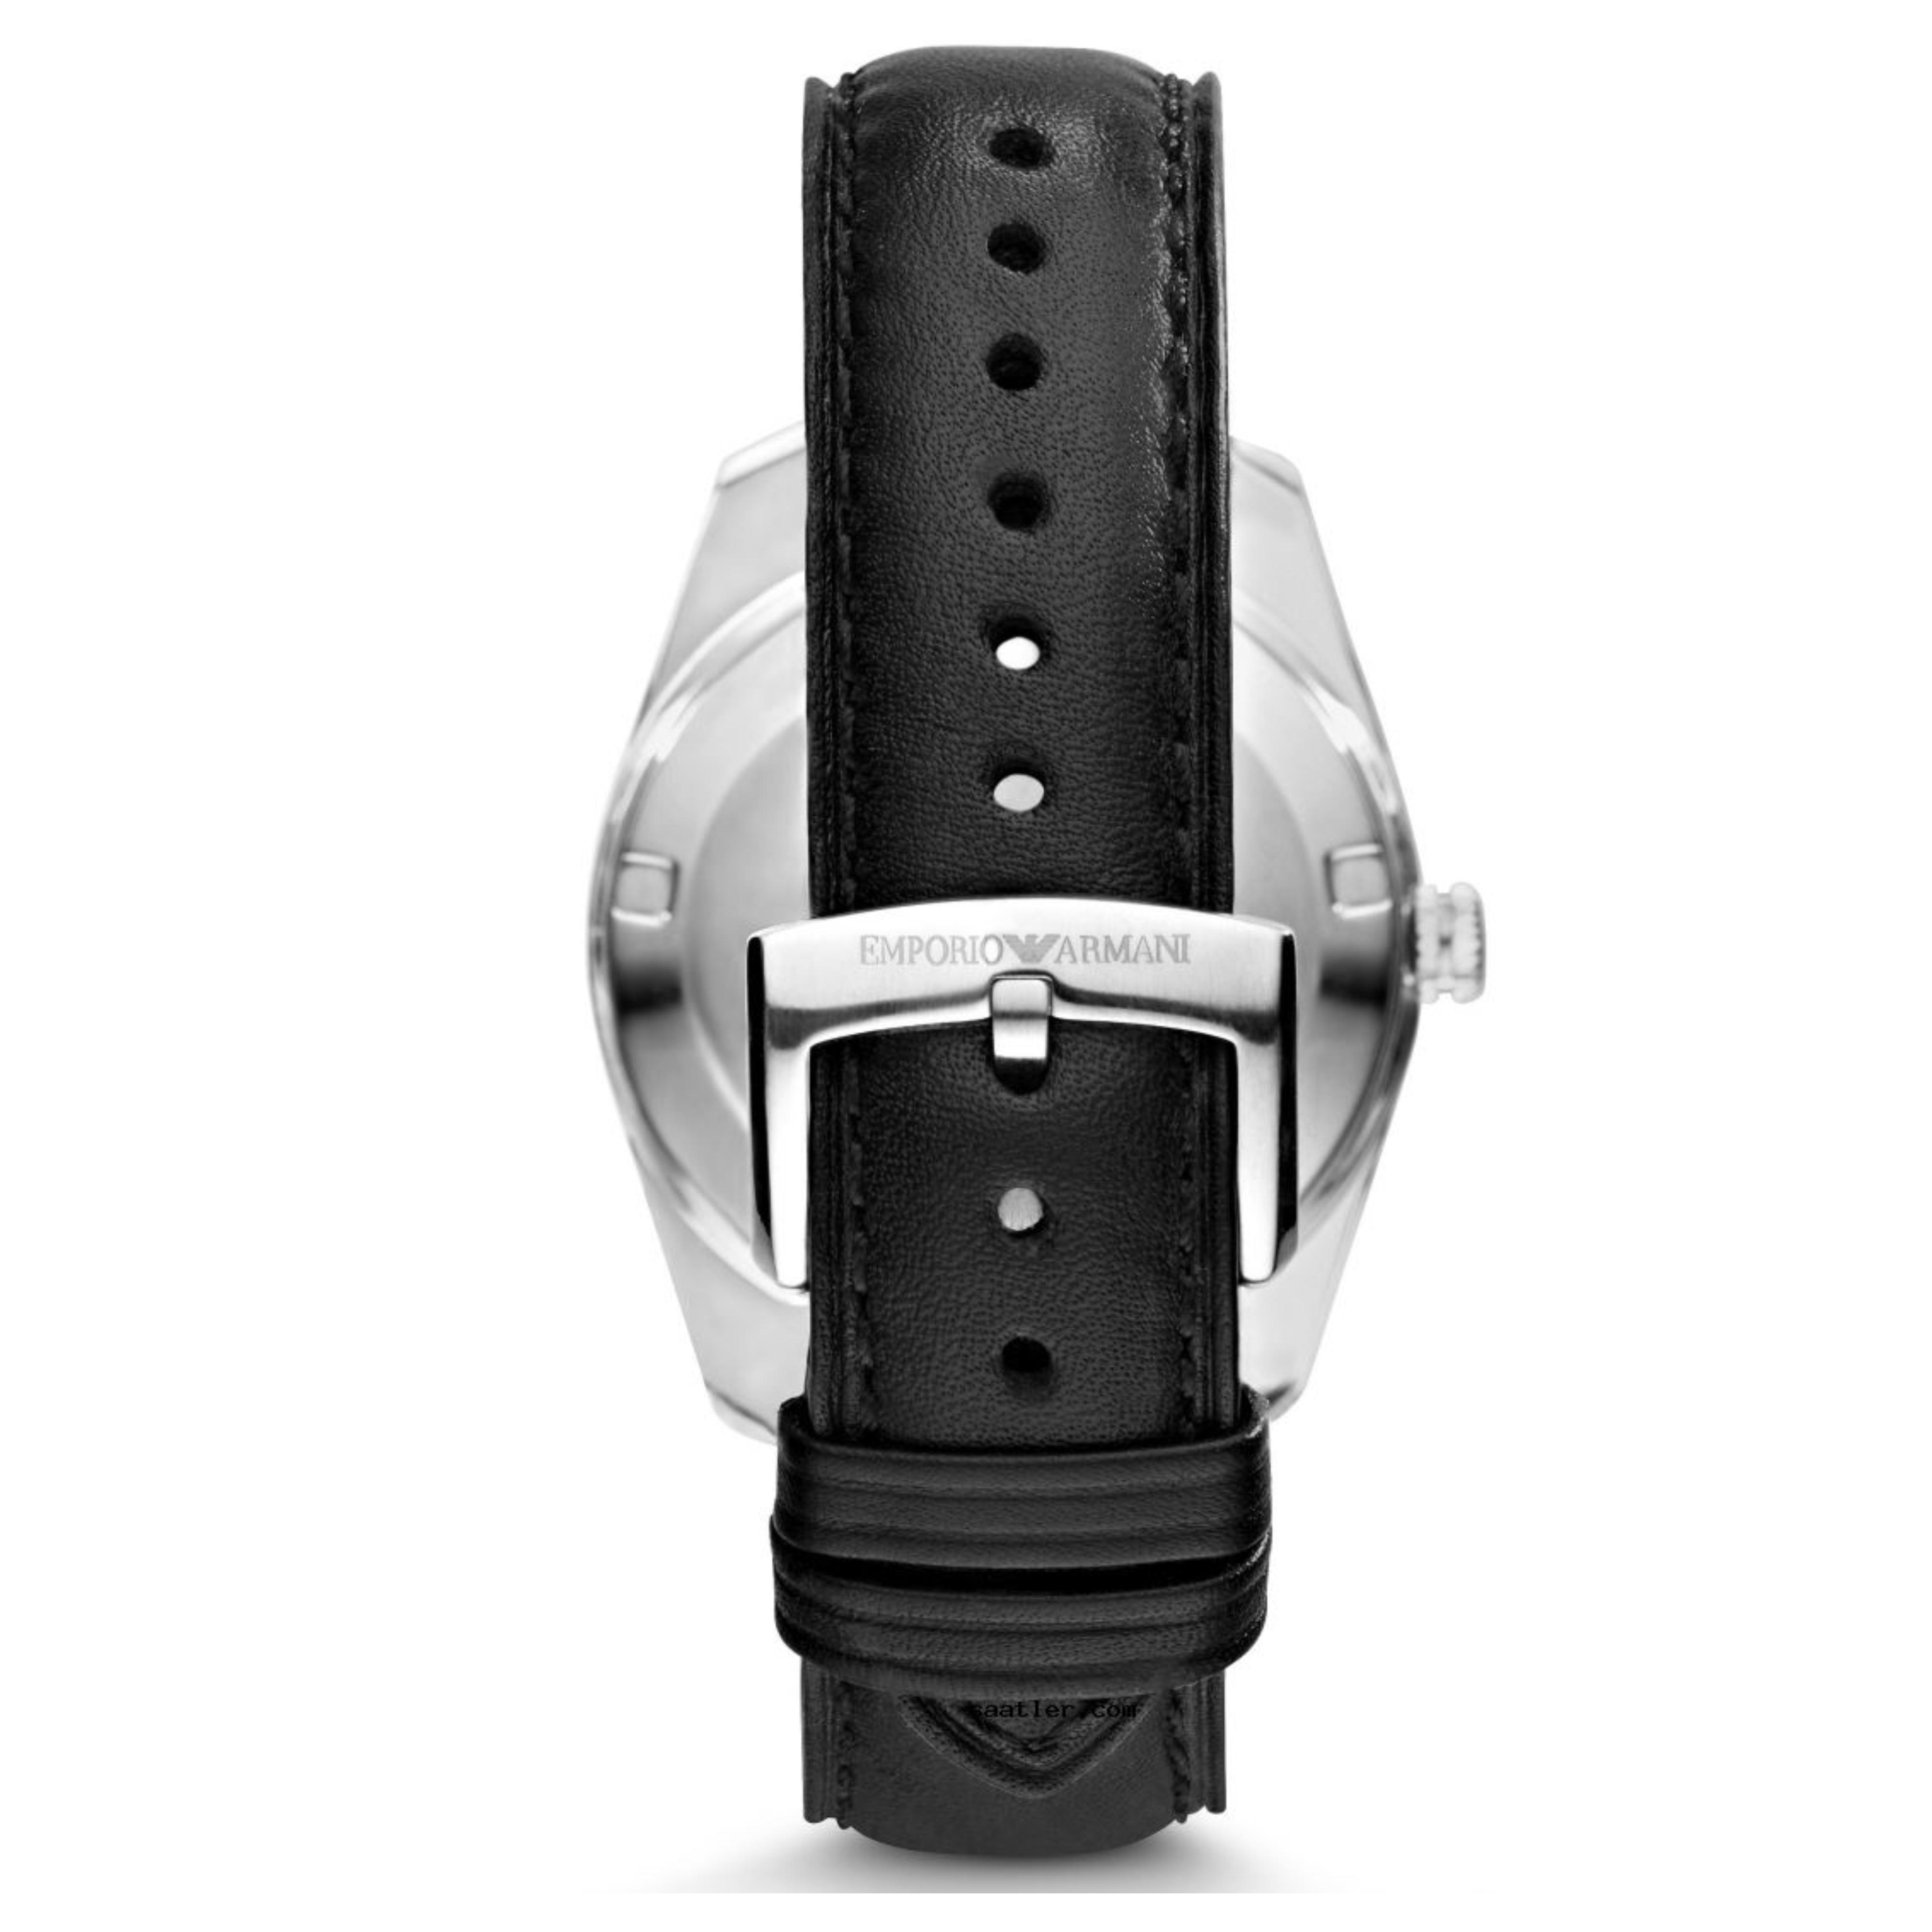 61847a344ad7 Sentinel Thumbnail 3. Sentinel Emporio Armani Sportivo Men s Watch AR6015│Silver  Round Dial│Black Leather Strap